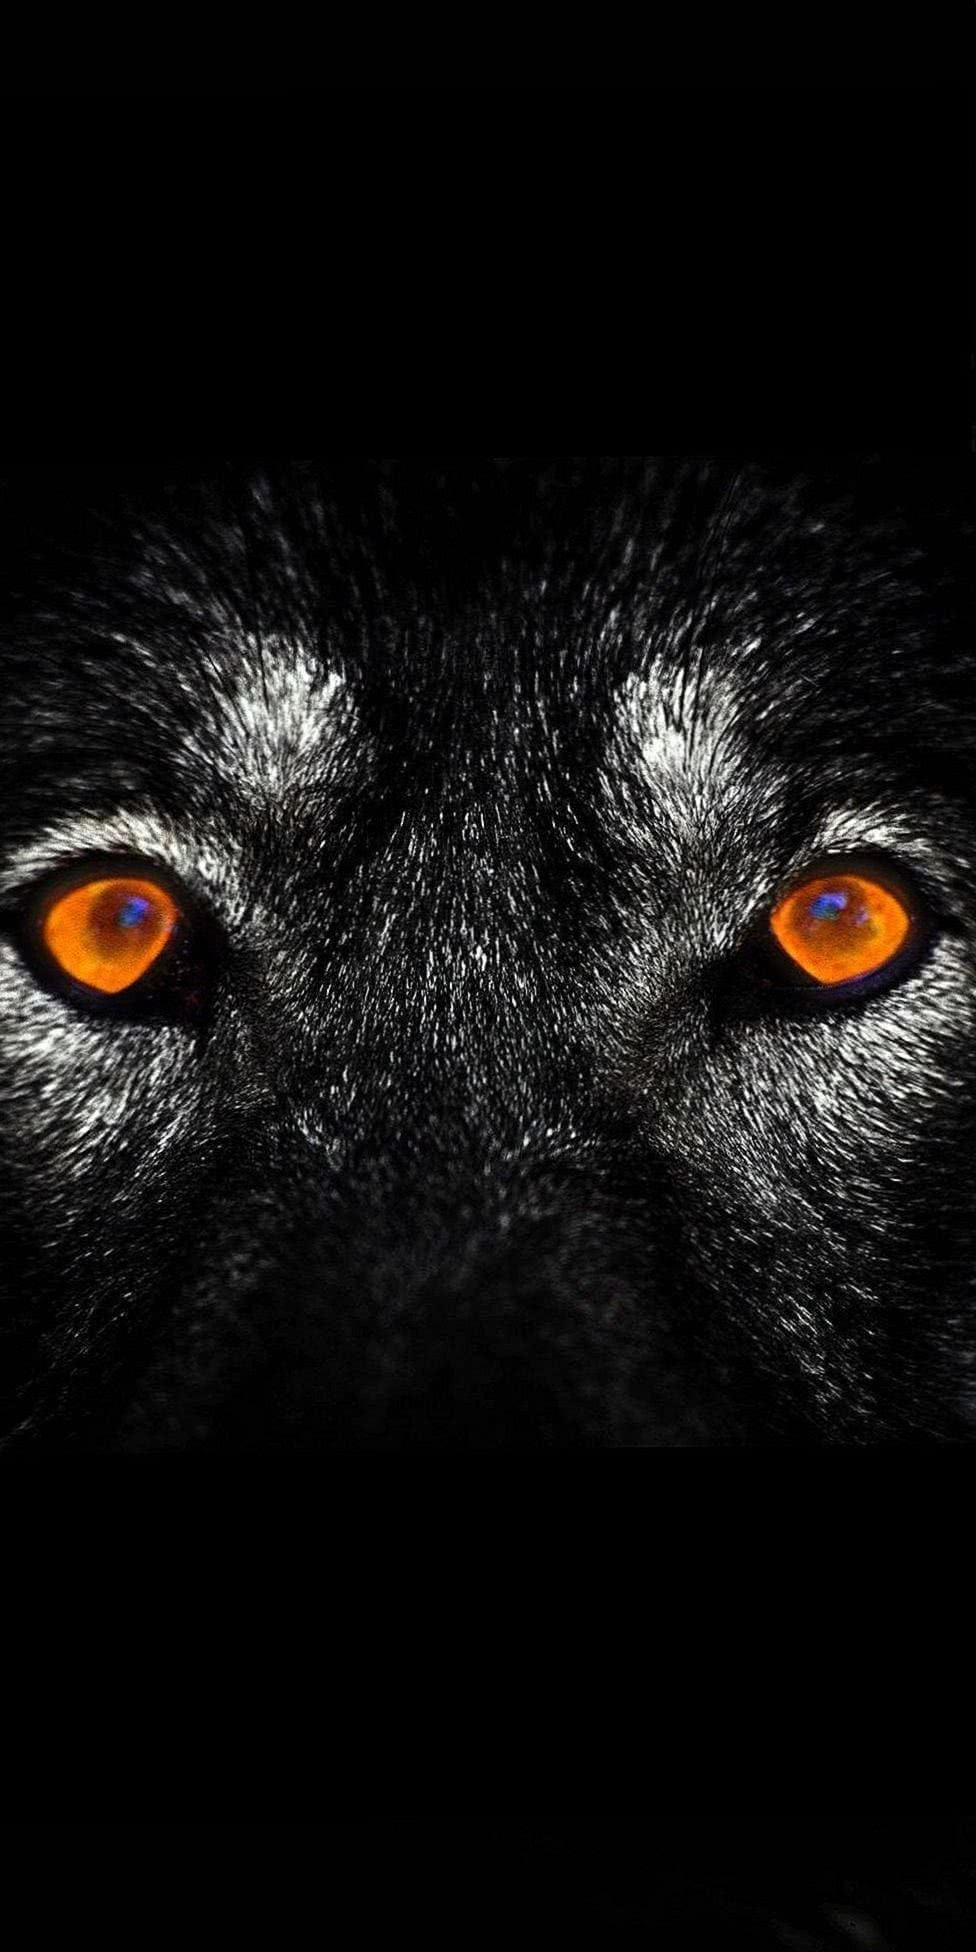 Wolf Eye Wallpapers 4K